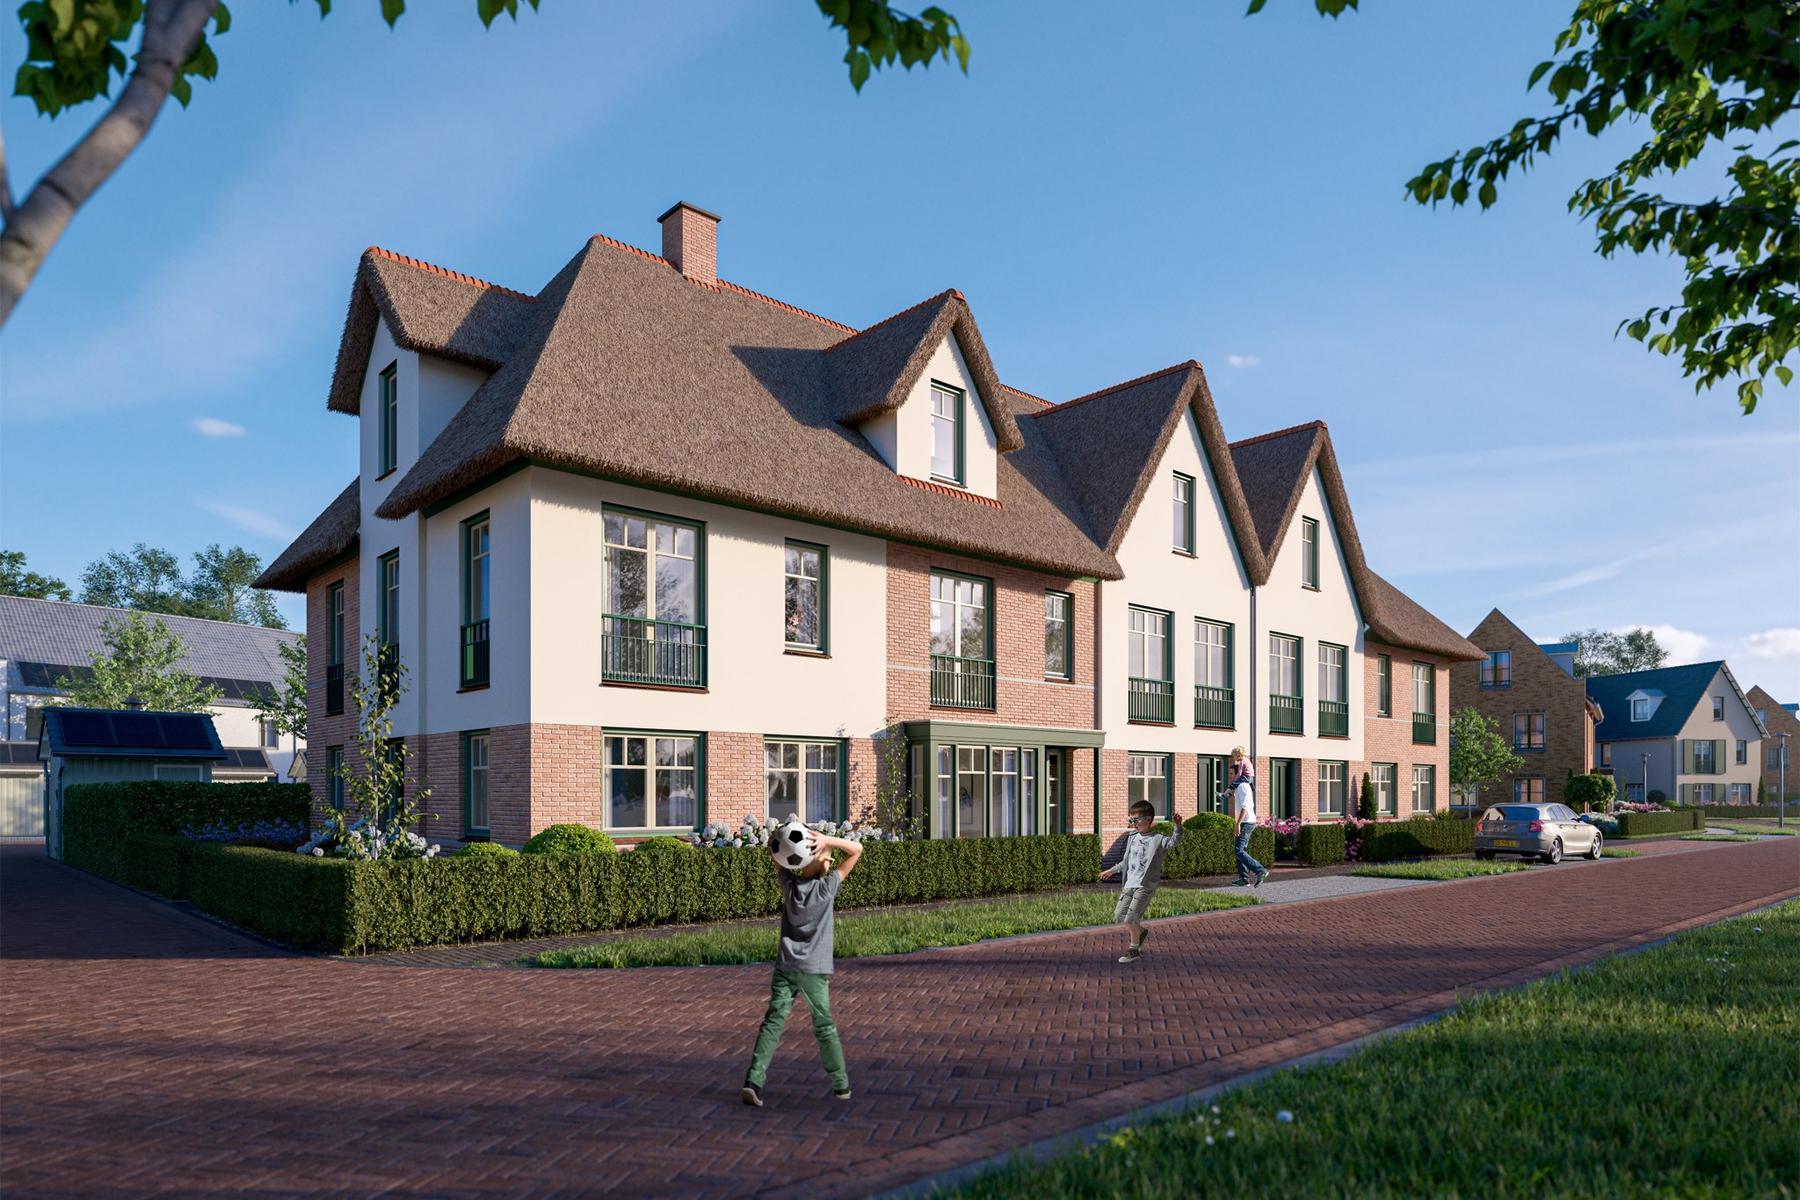 Nieuwbouw-woonpark-hoevelaken-exterieur-type-E.jpg